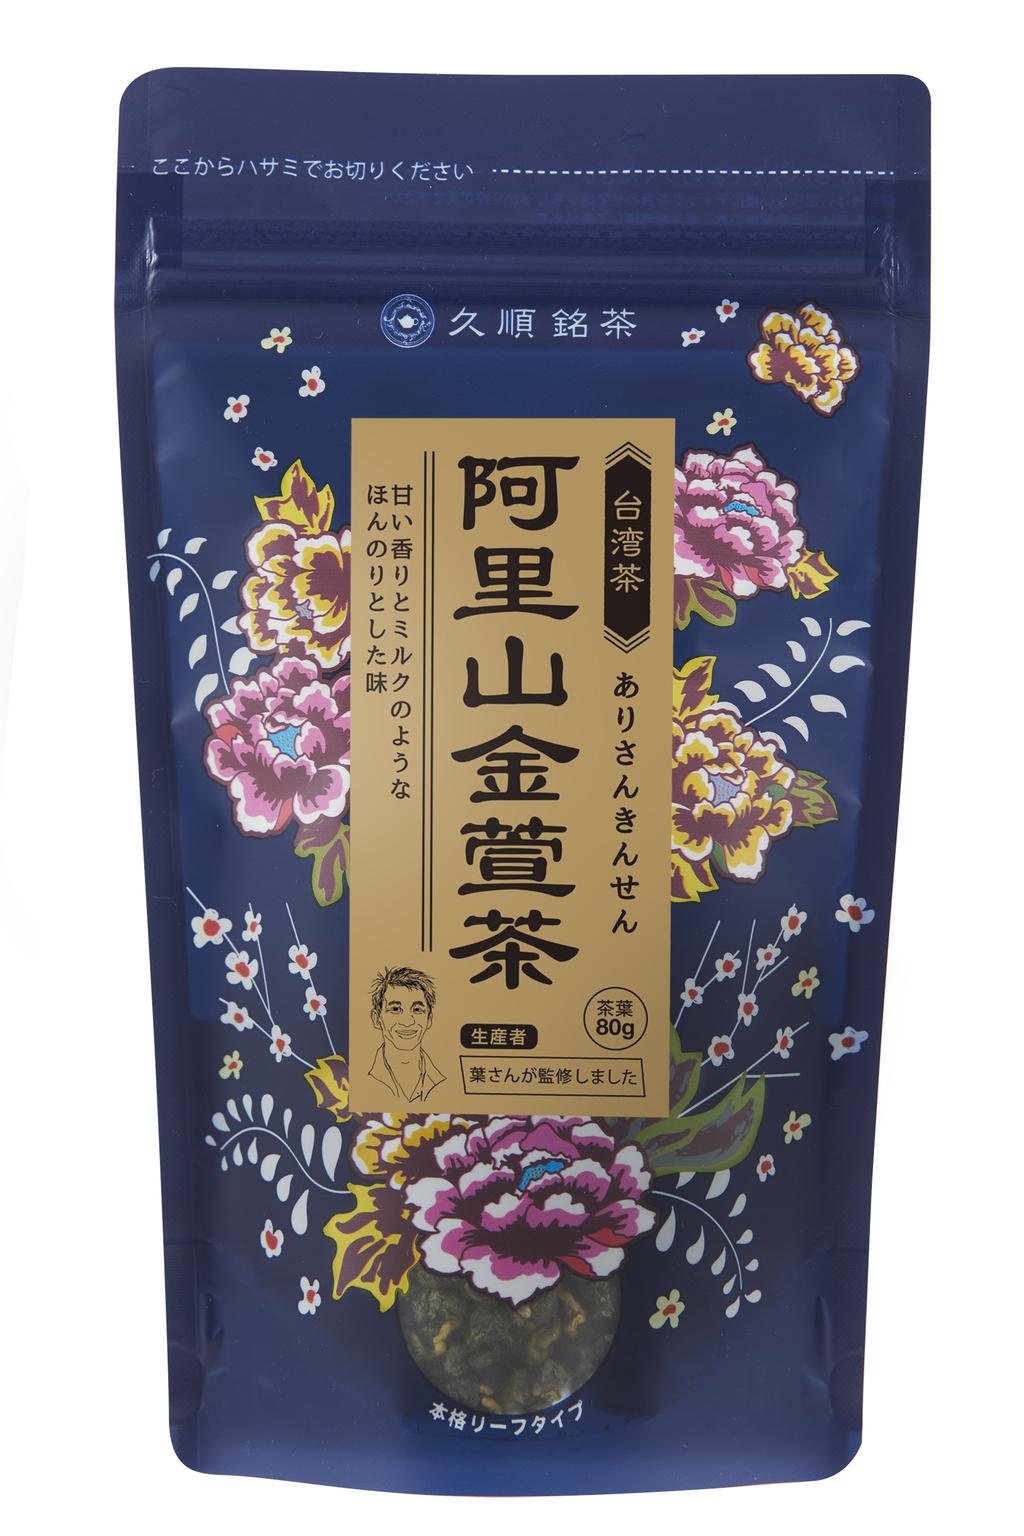 Tokyo Tea Trading 久順銘茶 阿里山金萱茶